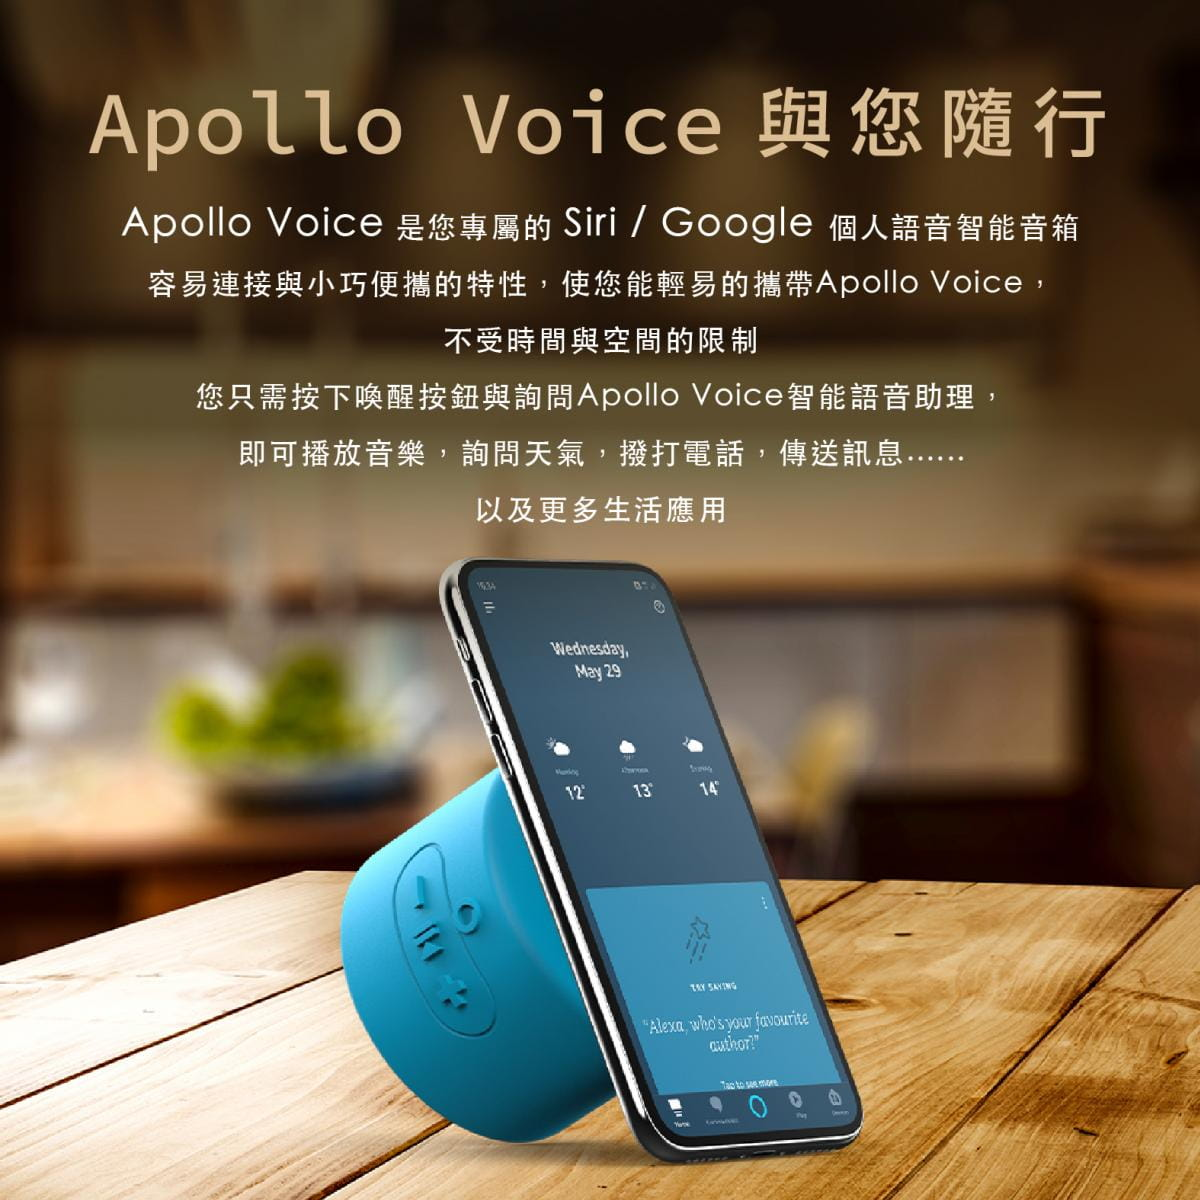 Addon Apollo Voice攜帶式Siri/Google藍芽智能音箱 2